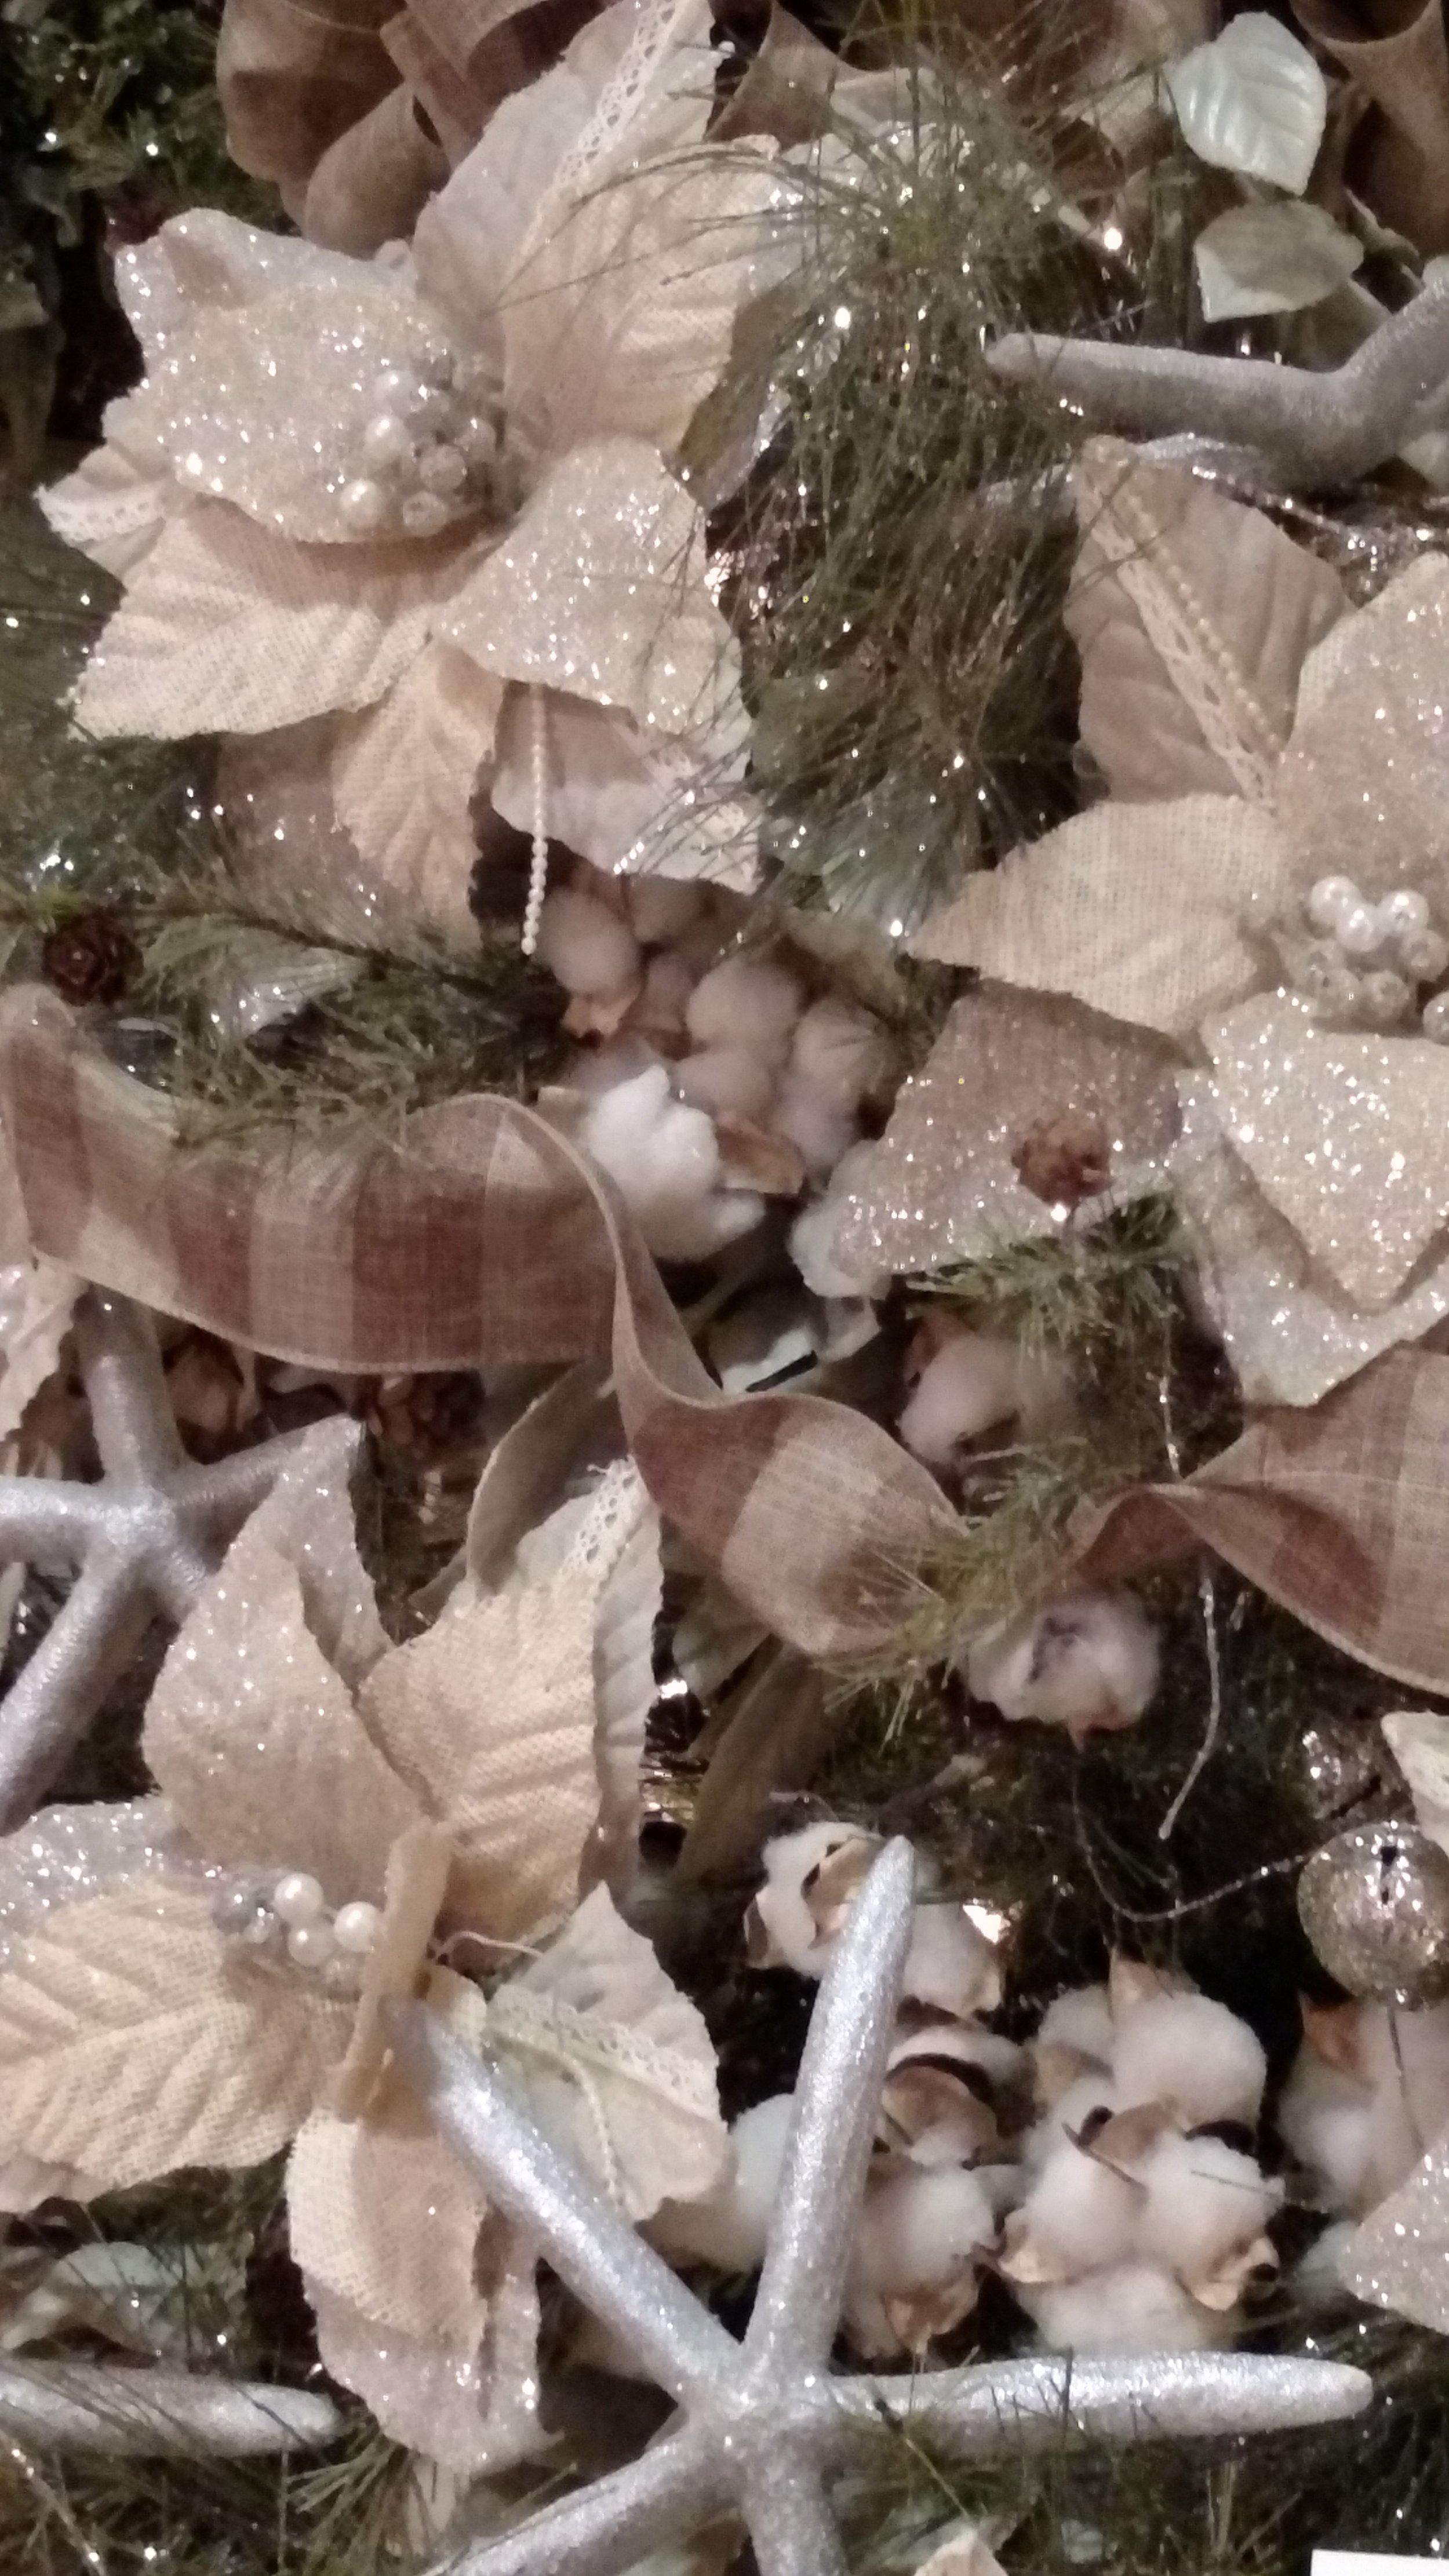 Blush Poinsettias, Plaid Ribbon, Natural Cotton and Starfish Christmas Tree Decor